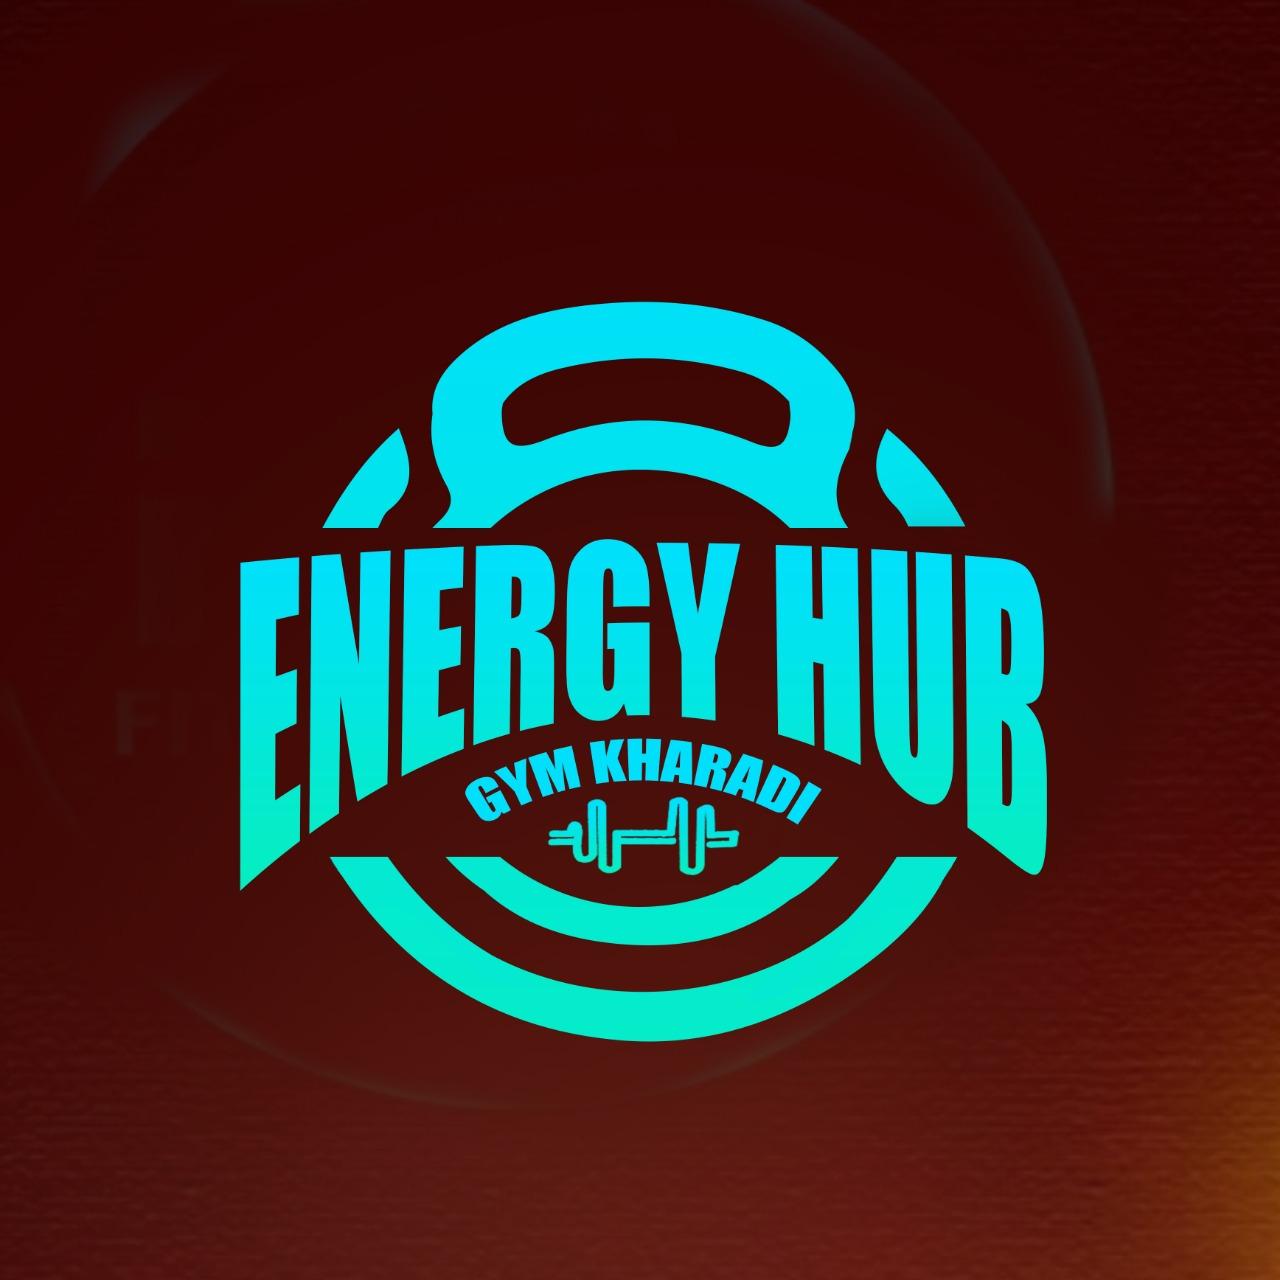 Energy Hub Gym